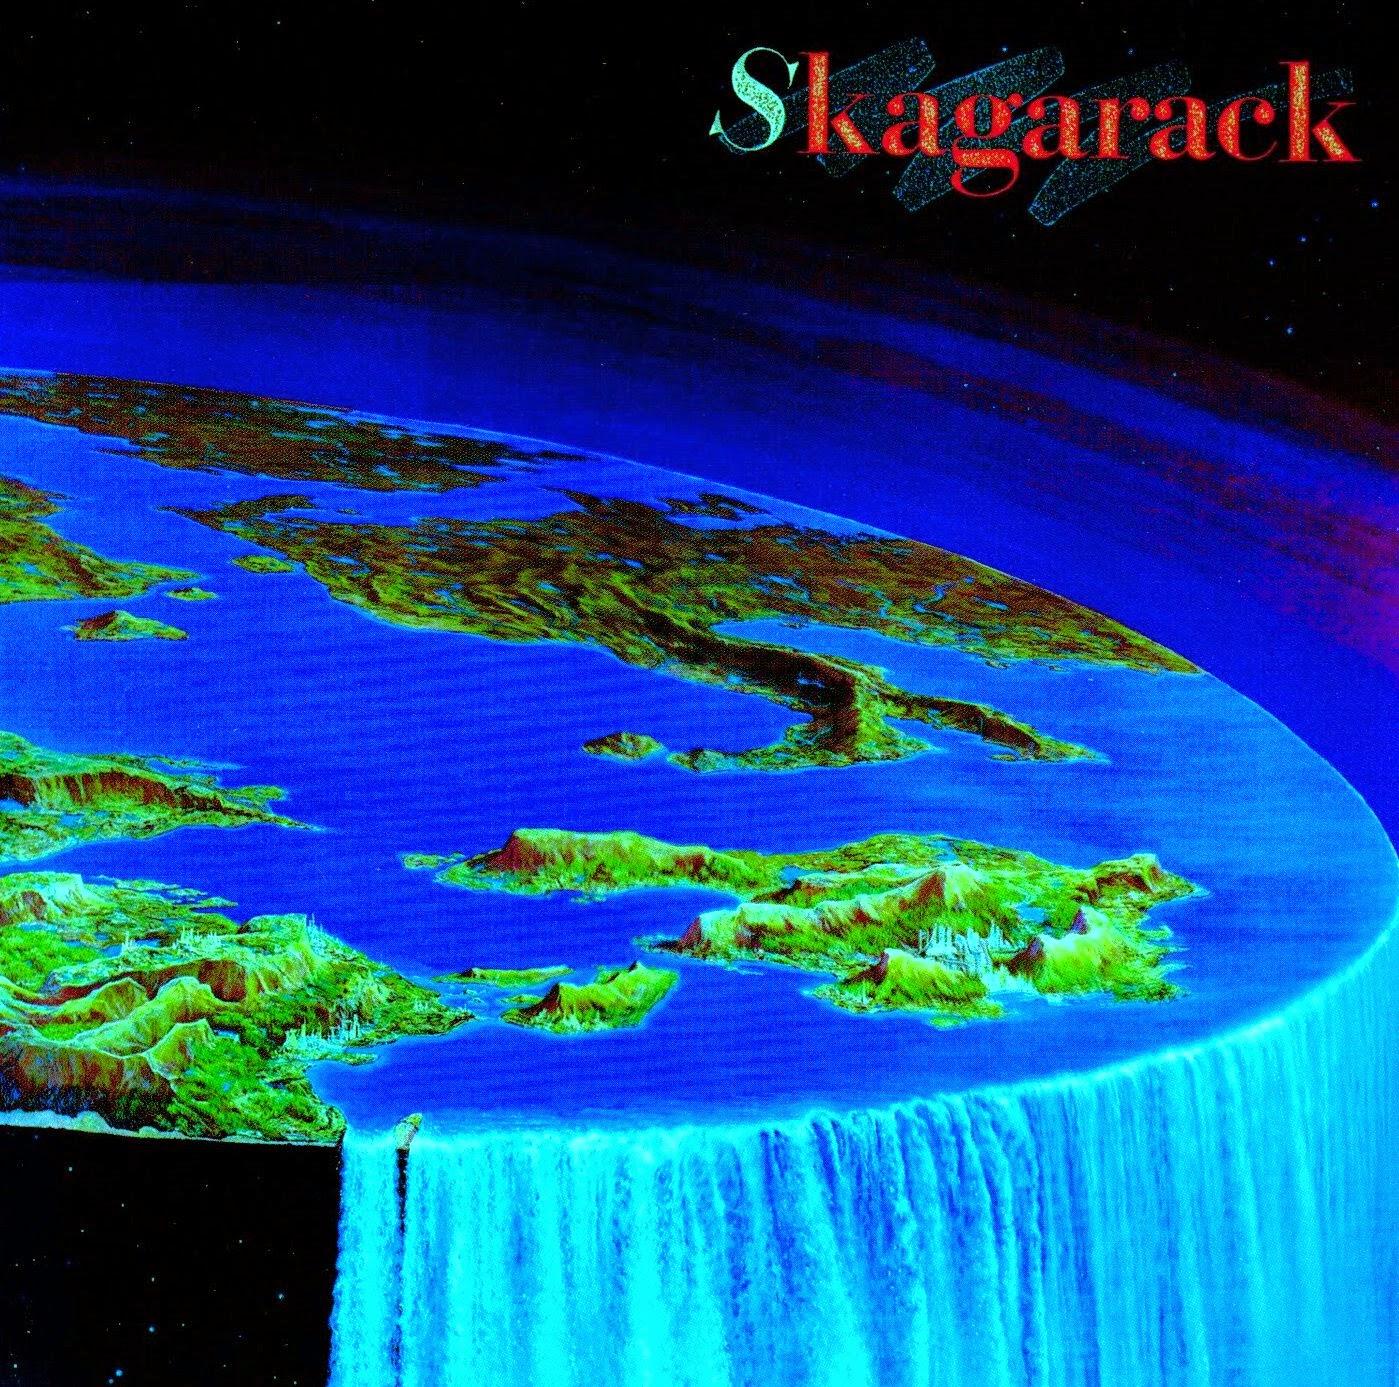 Skagarack st 1986 aor melodic rock music blogspot albums bands